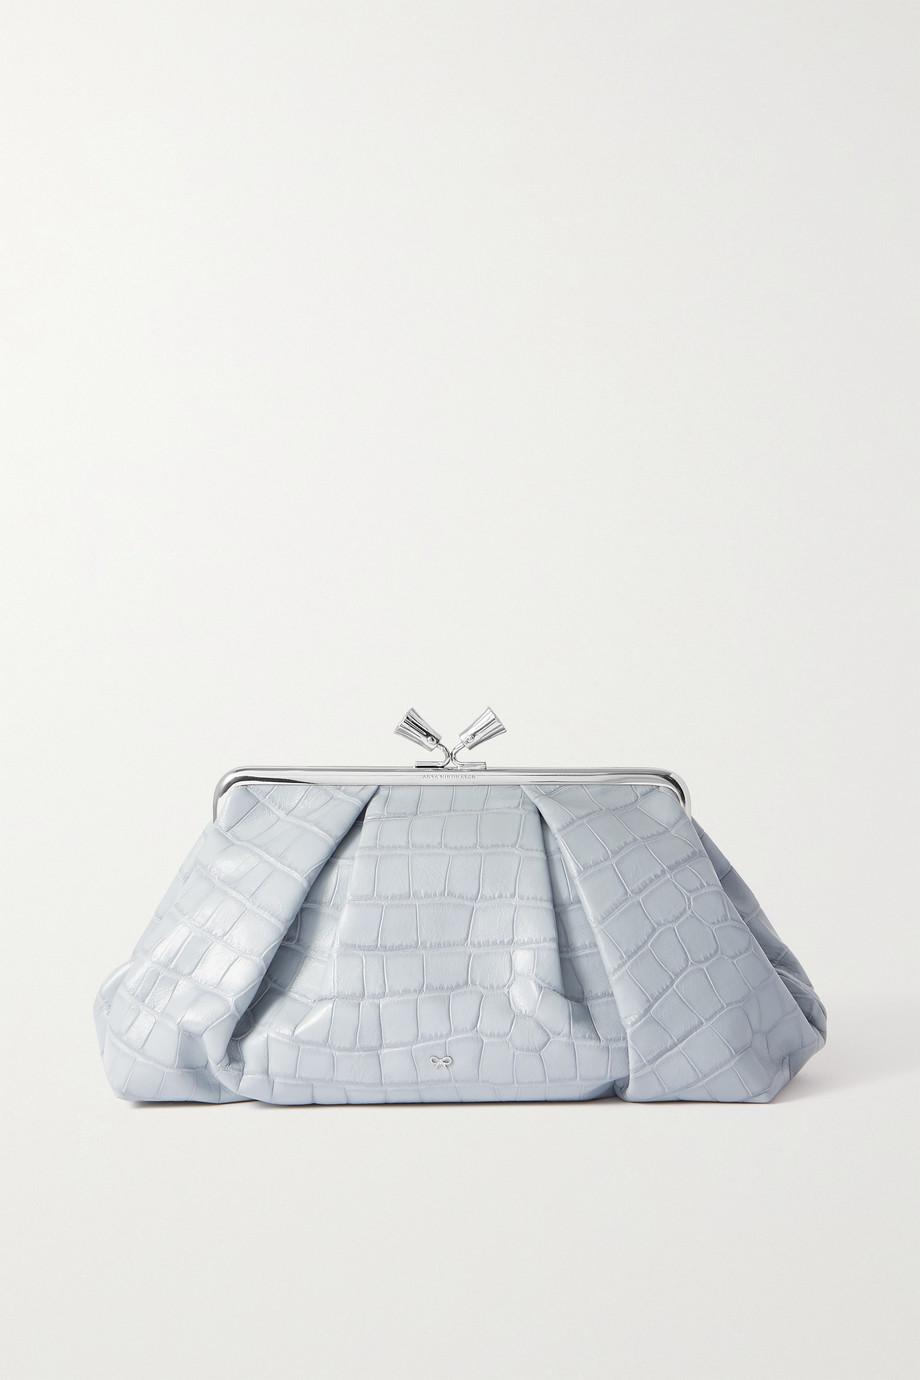 Anya Hindmarch Maud croc-effect leather clutch